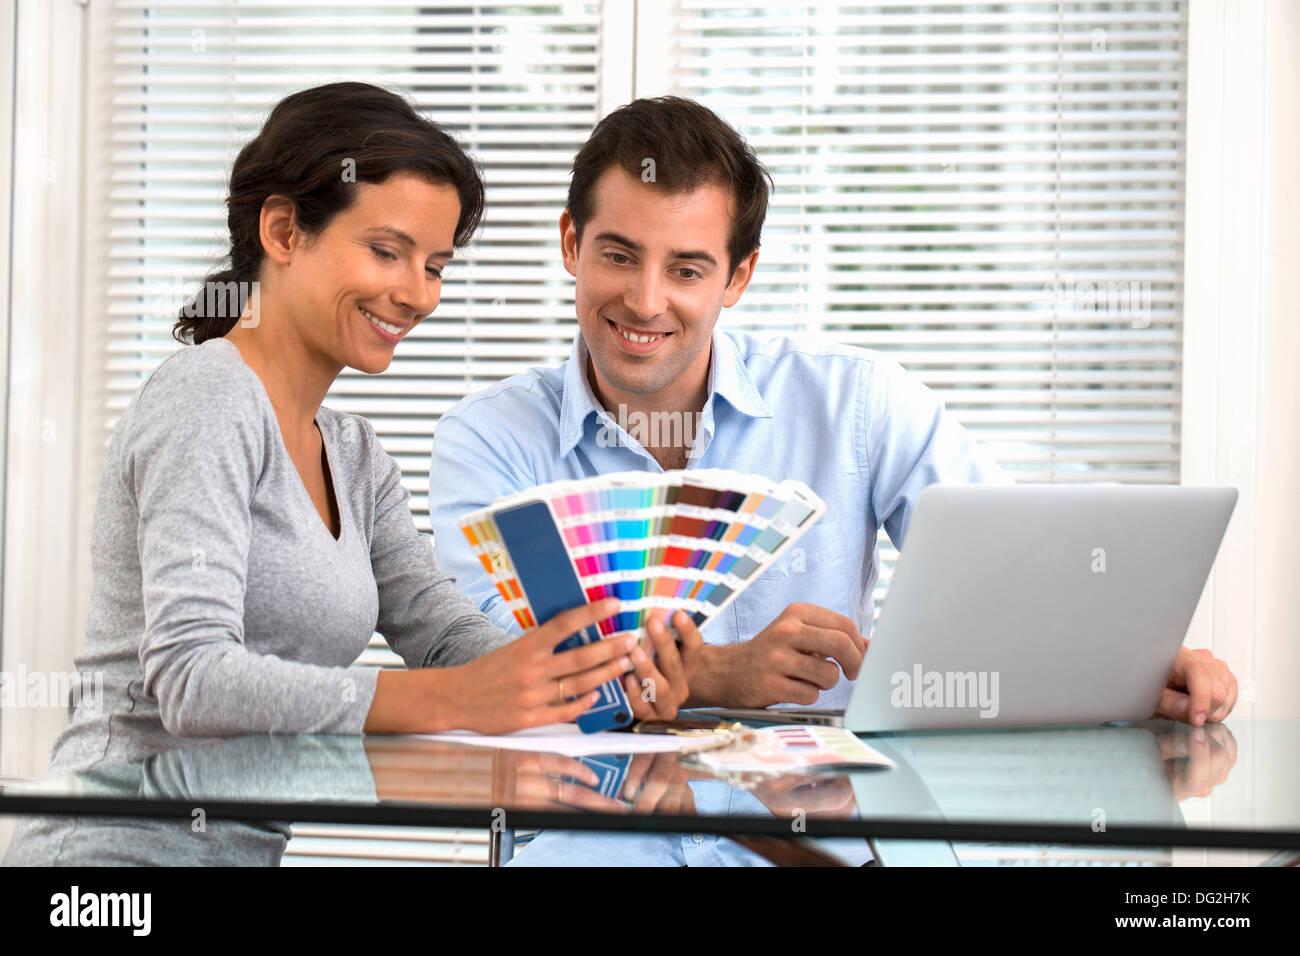 woman man computer laptop painting - Stock Image